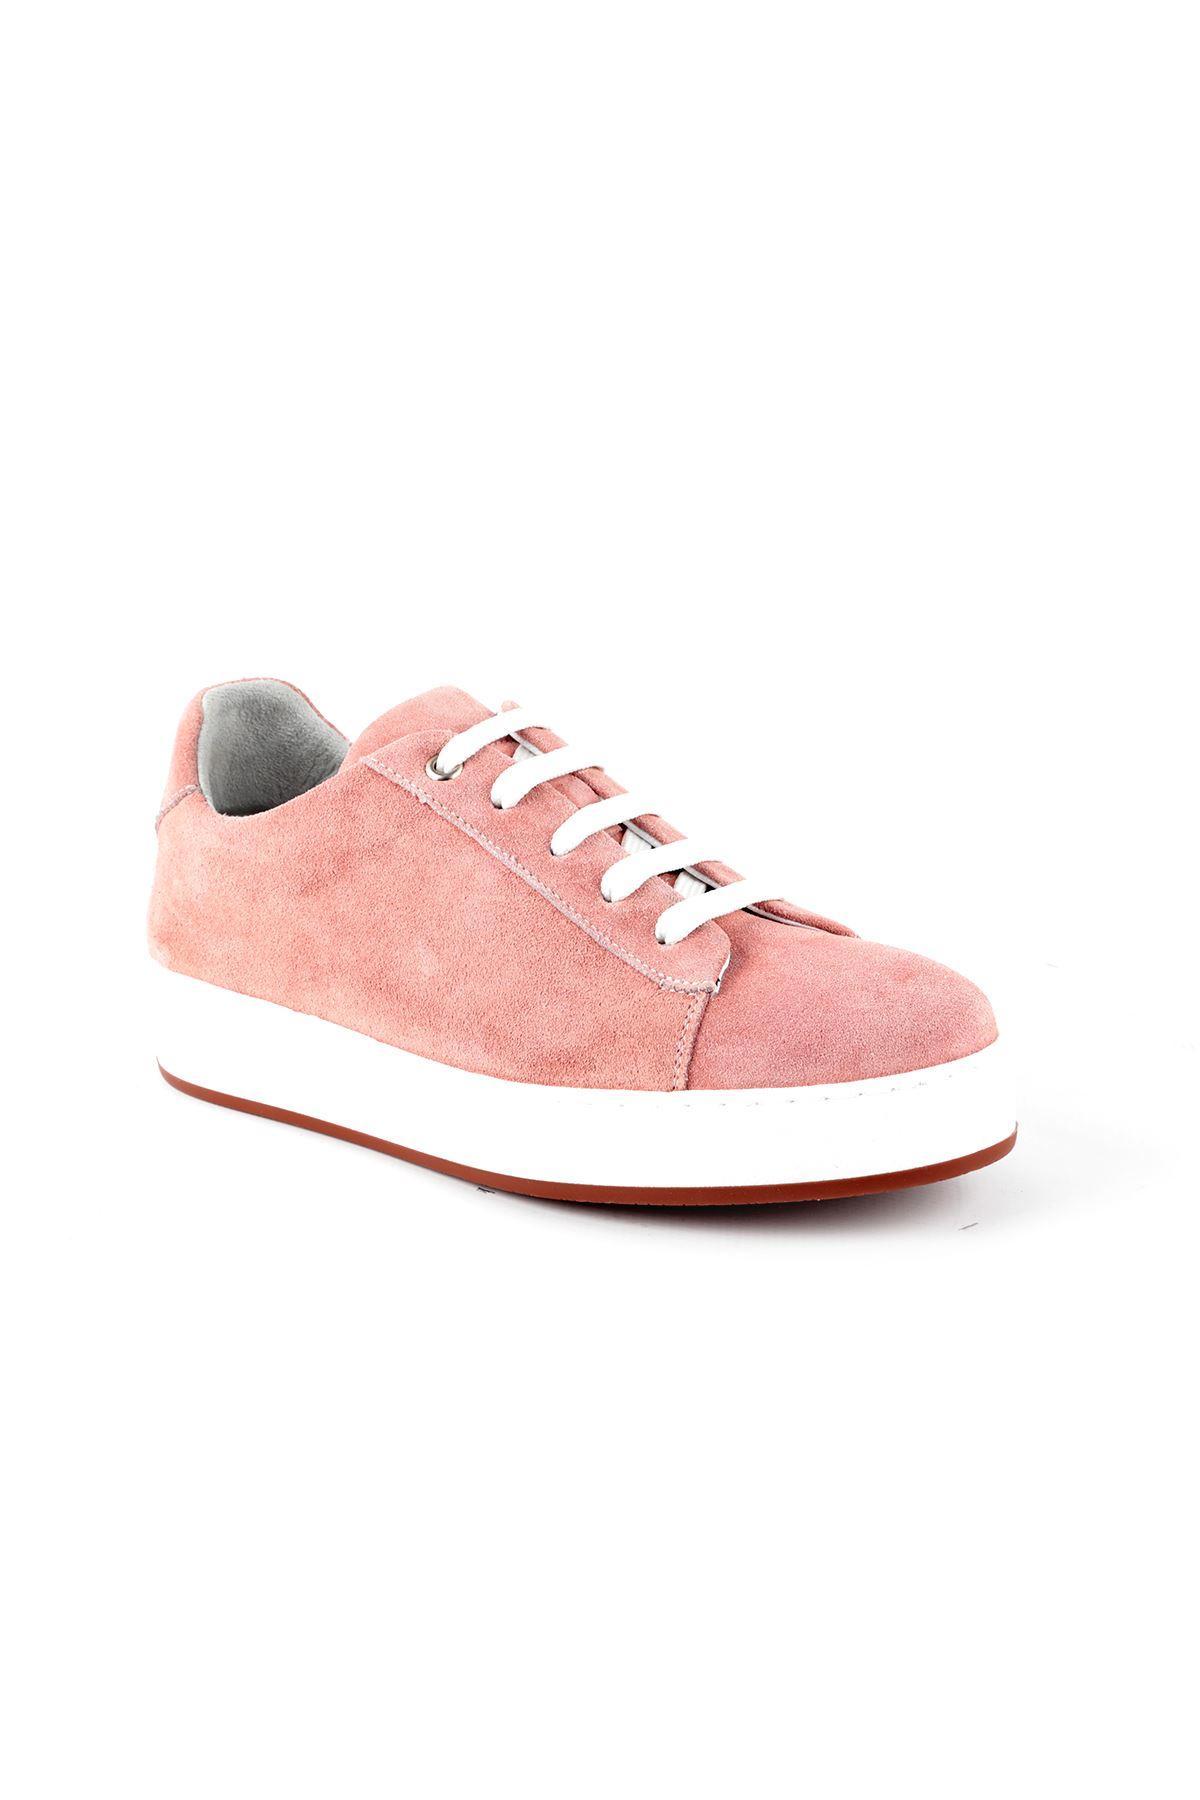 Libero Dİ2026 Pudra Kadın Spor Ayakkabı